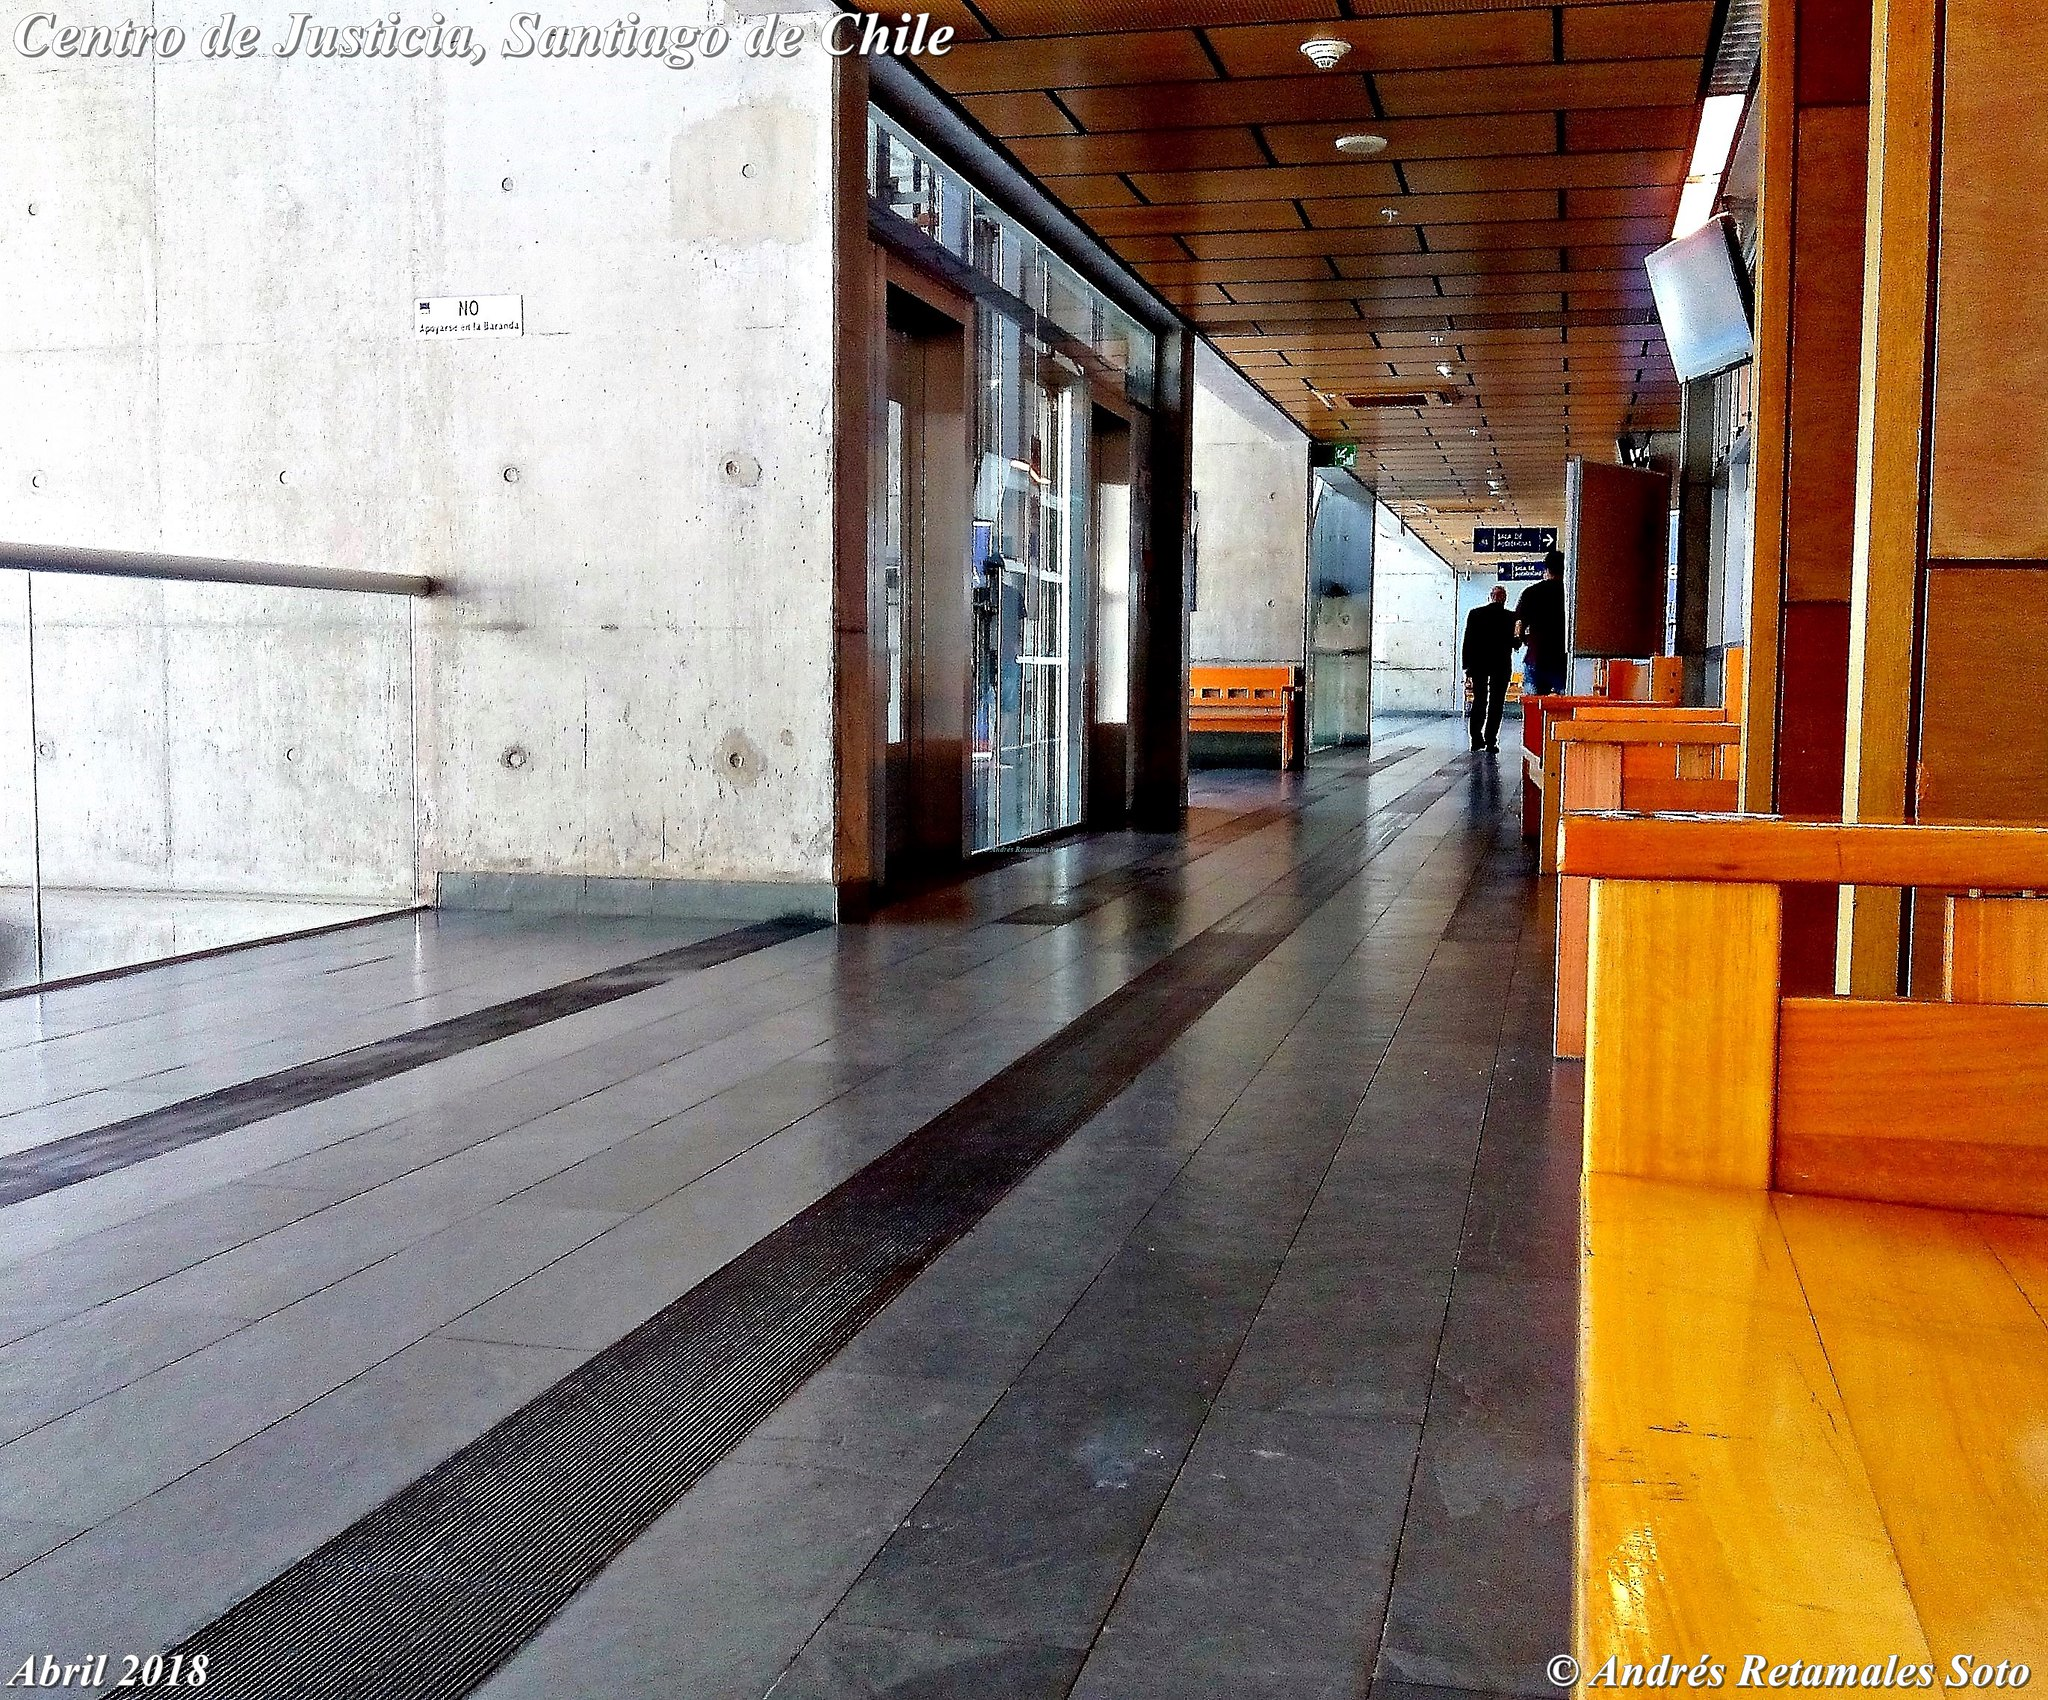 Centro de Justicia, Santiago de Chile. Pasillos de Juzgado de Garantía. Abril 2018